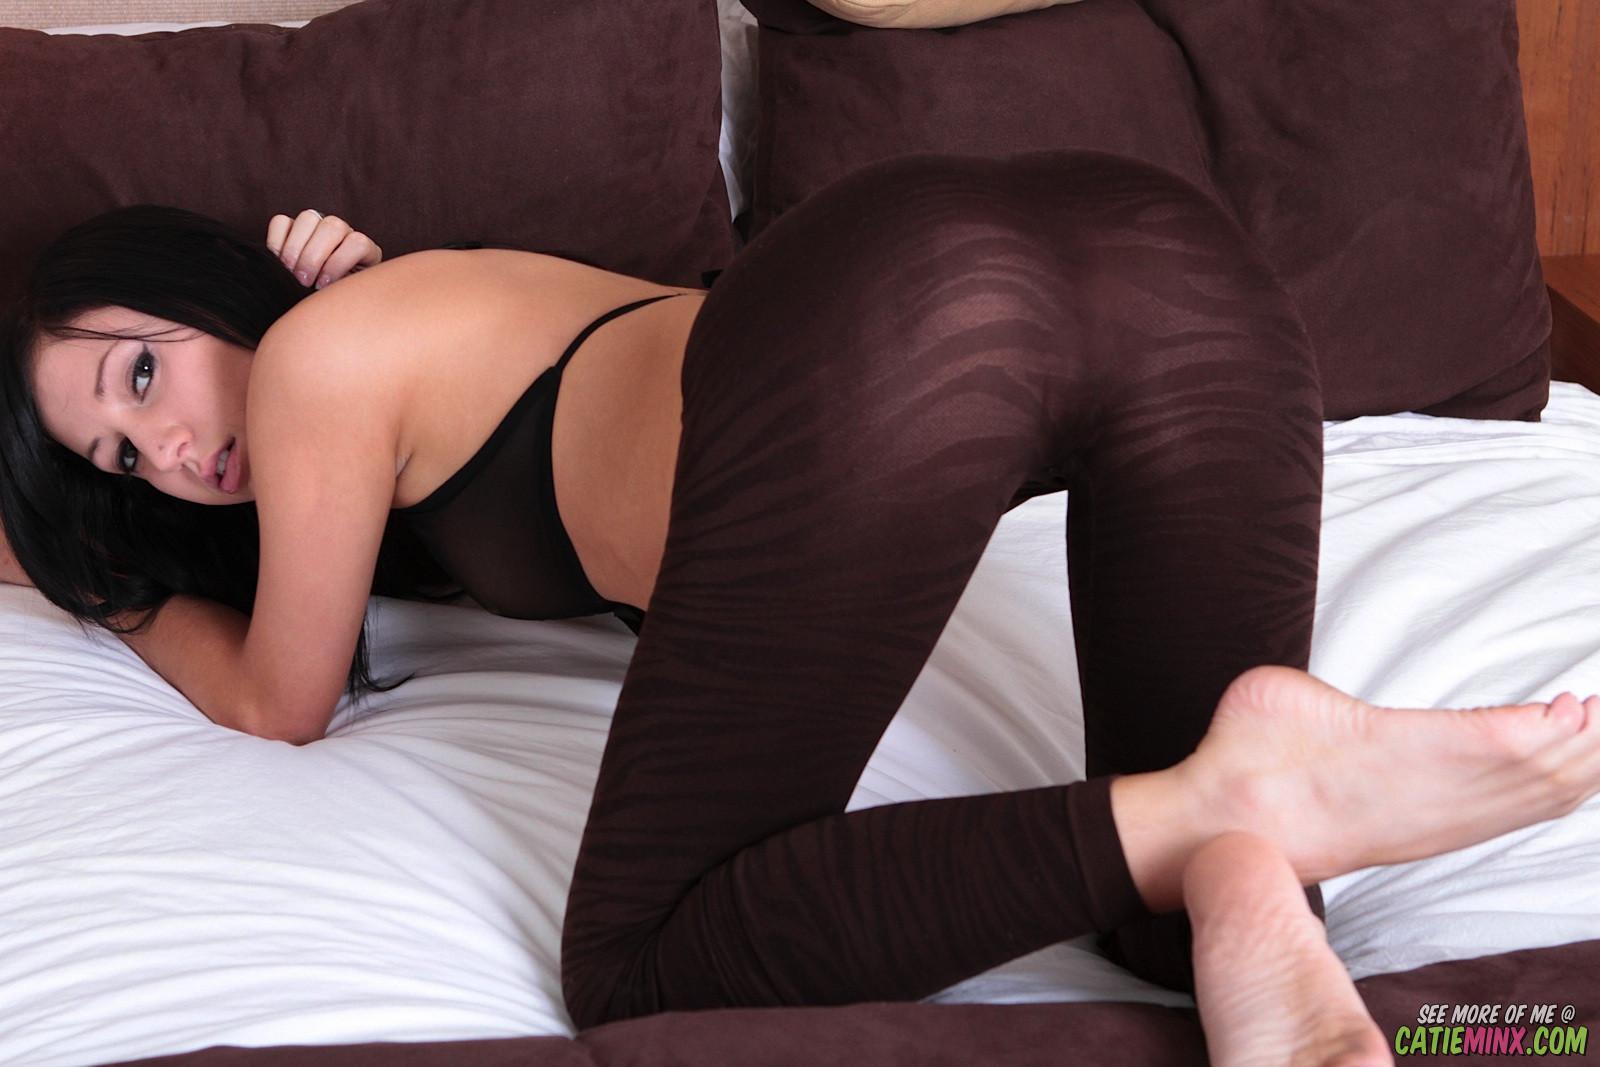 Catie minx fingering and fuzzy anal bunny anal dildo